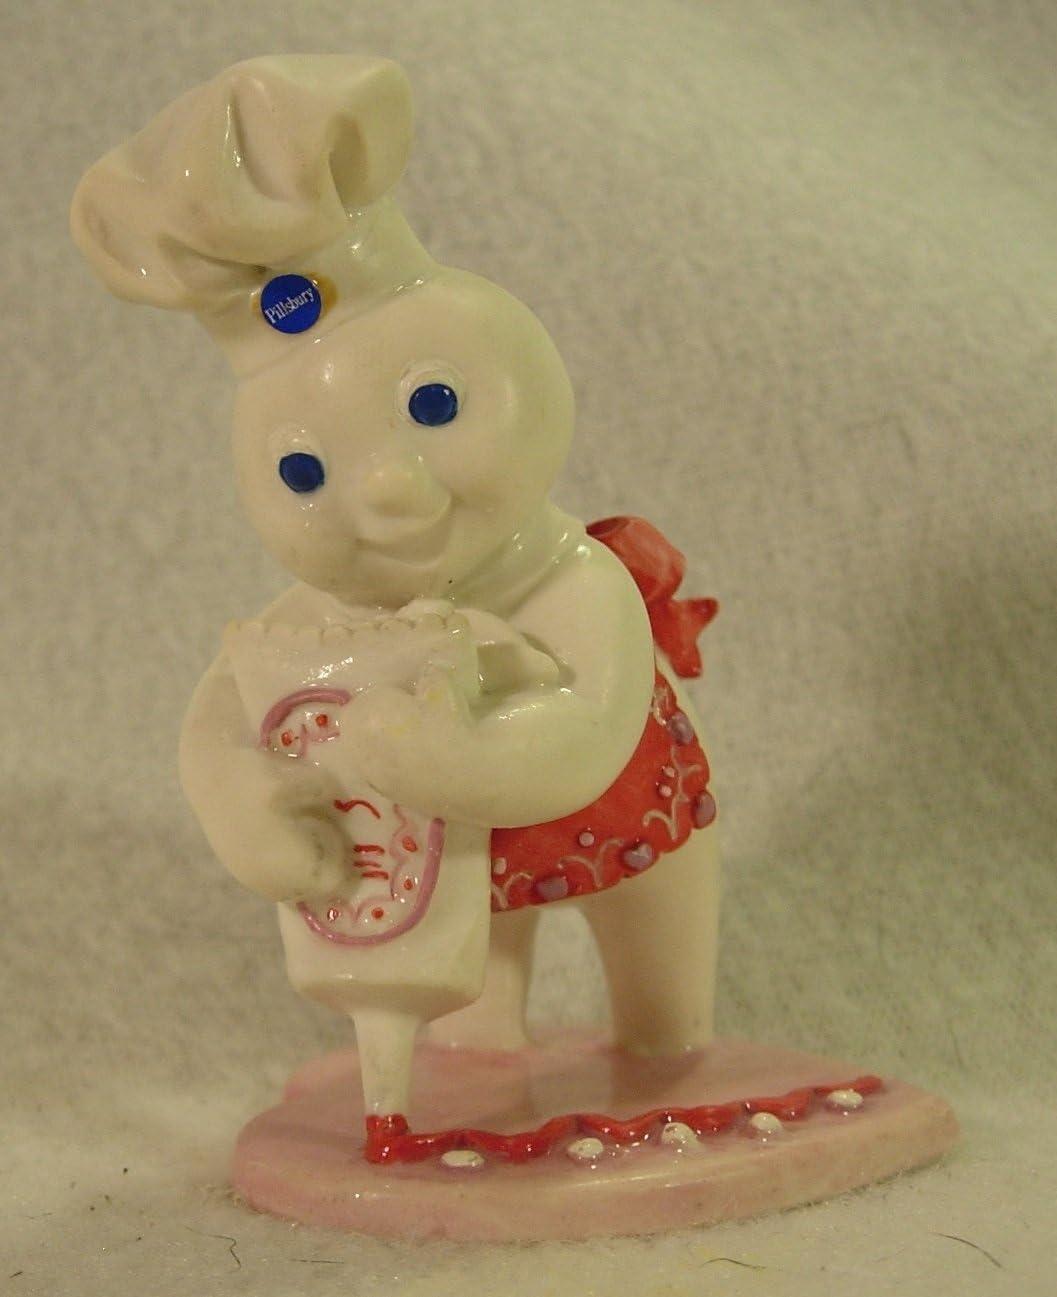 Pillsbury Danbury Mint Doughboy 1997 February Calendar Figurine